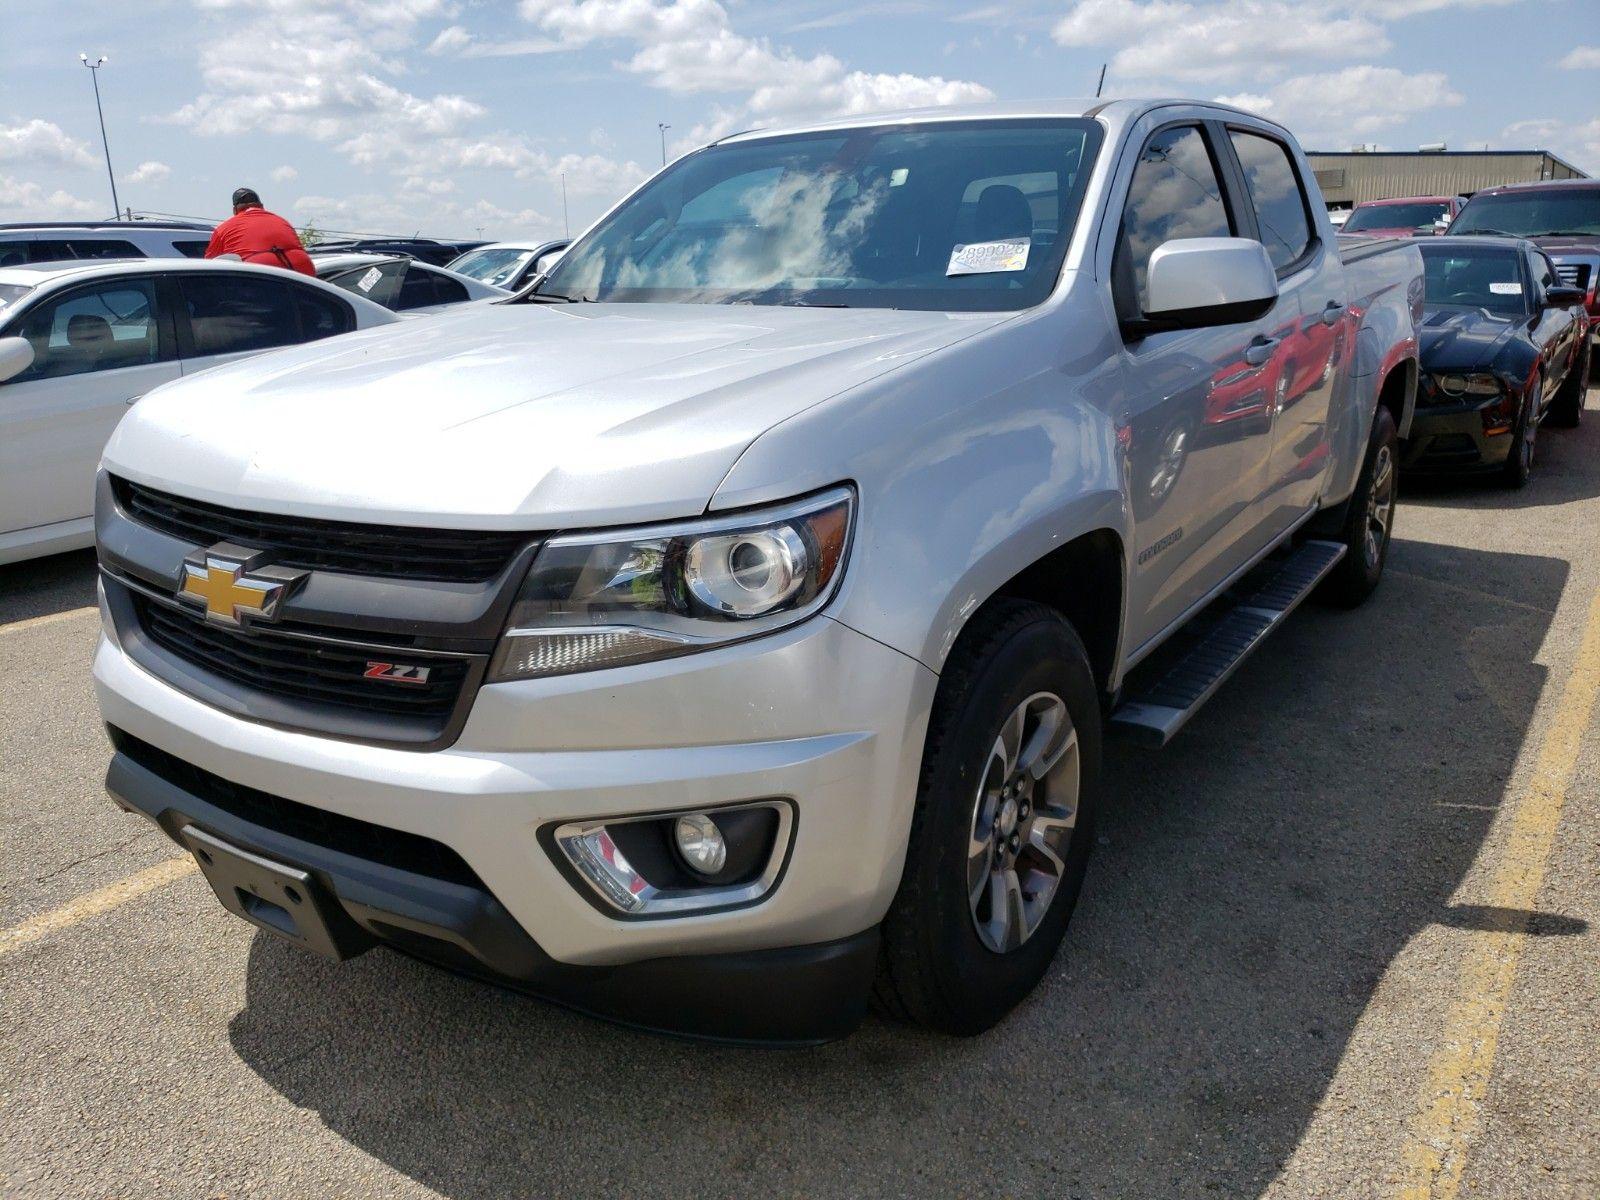 2016 Chevrolet Colorado 3.6. Lot 99913462855 Vin 1GCGSDE31G1277909